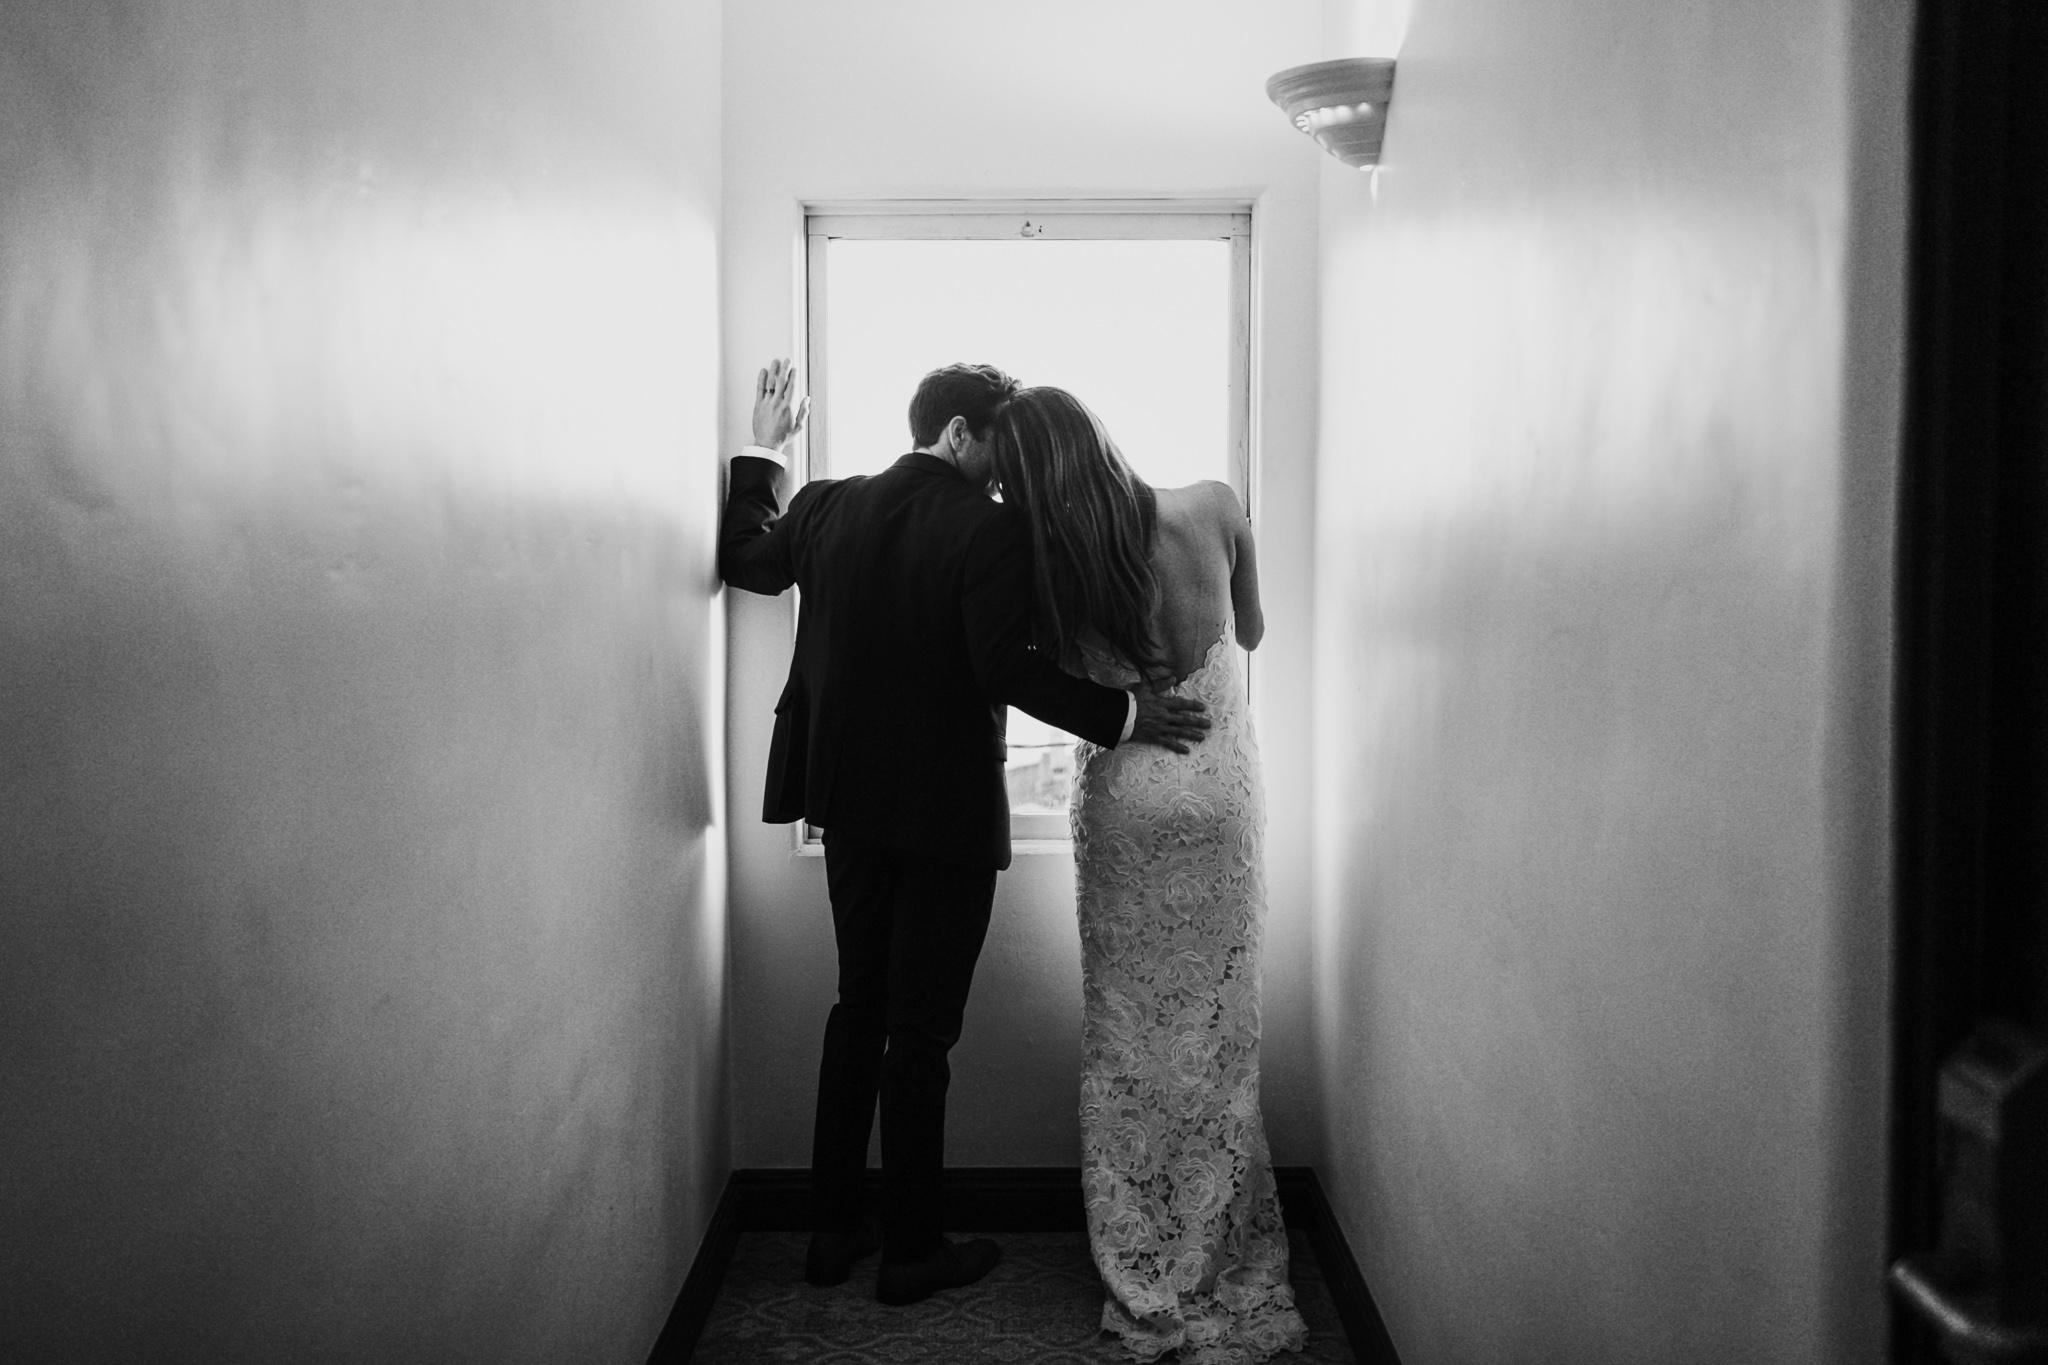 LagunaBeach-WeddingPhotographer-58.jpg